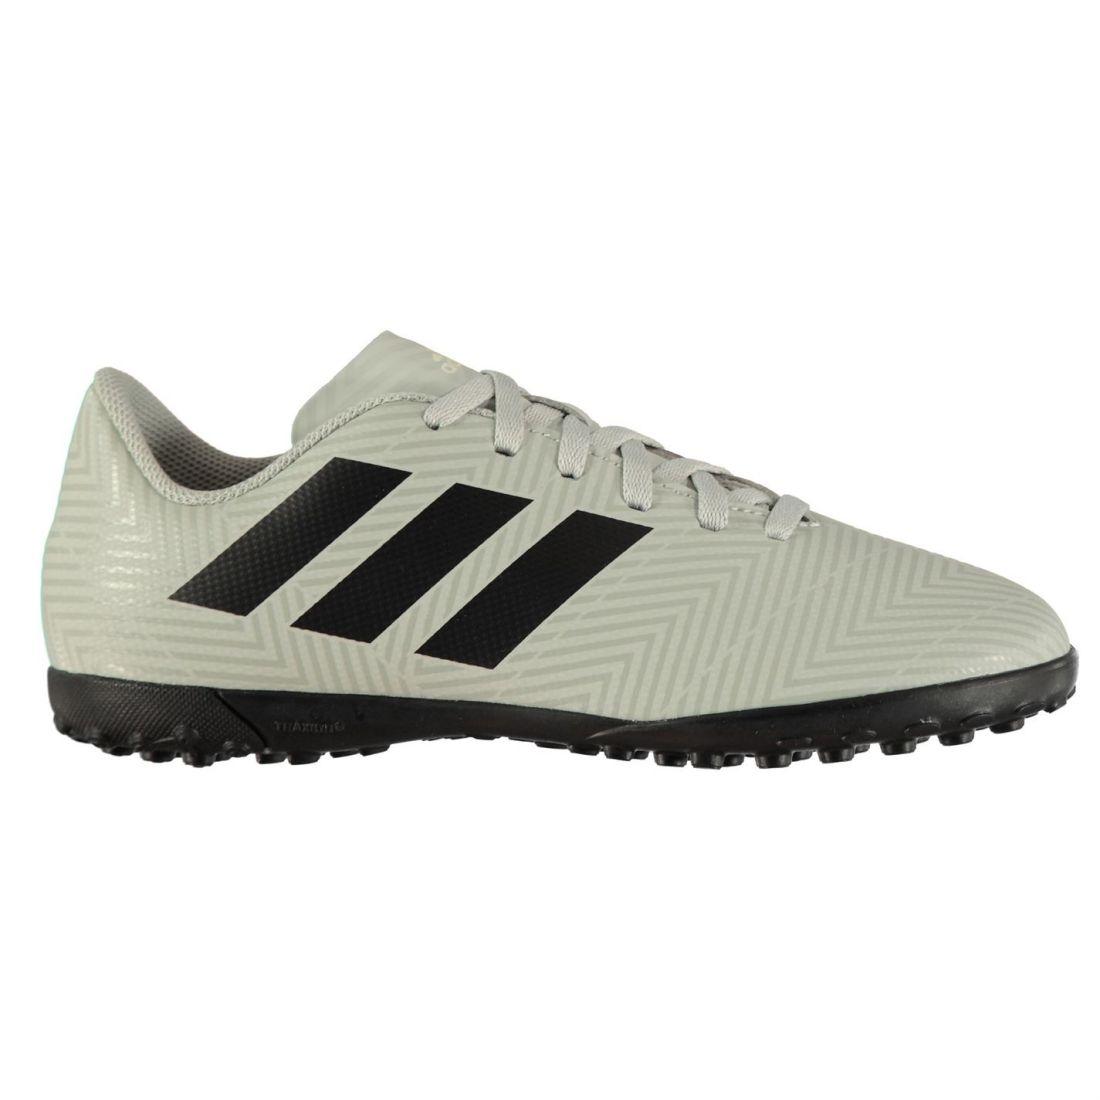 78468d73 Adidas Kids Boys Nemeziz Tango 18.4 Astro Turf Trainers Football Boots Lace  Up